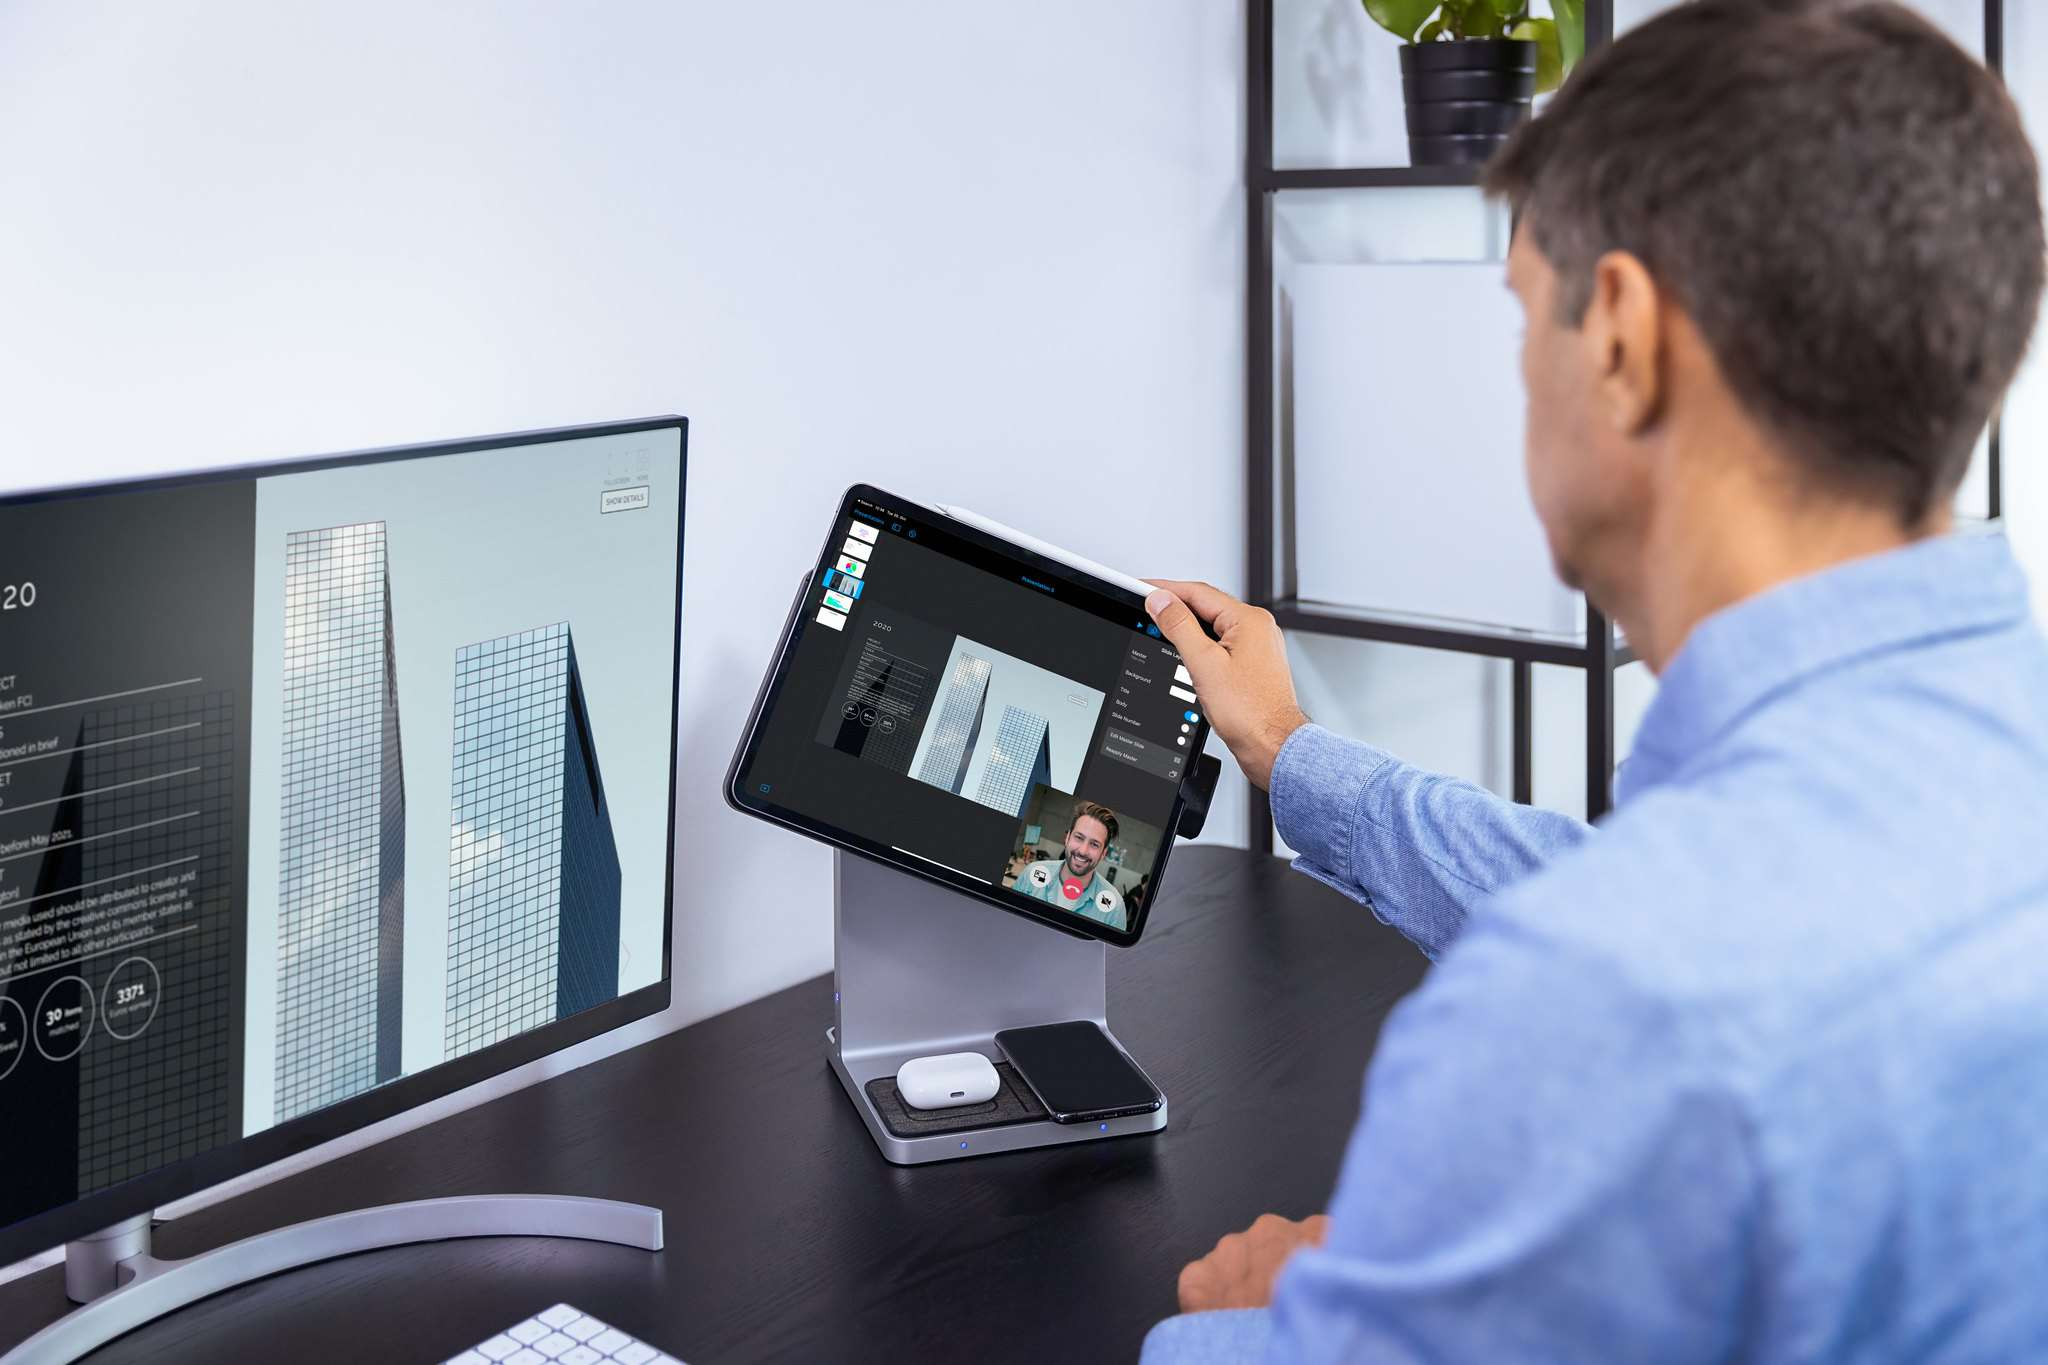 Person placing an iPad on the Kensington StarDock